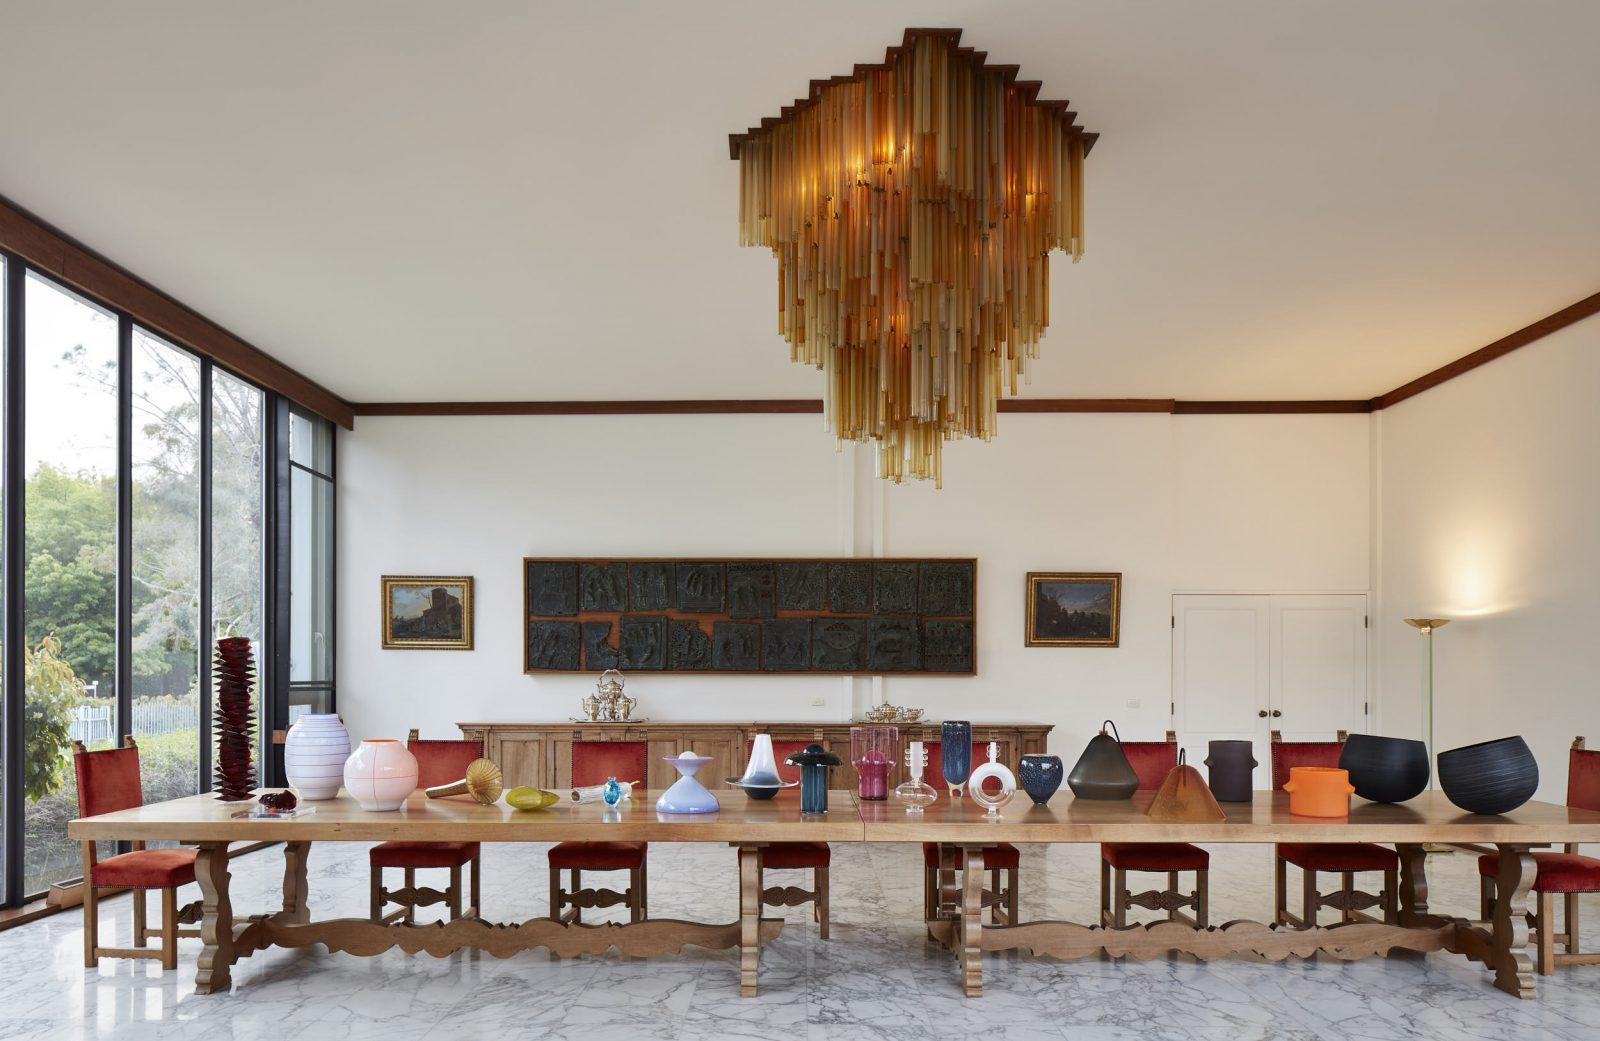 Glass Utopia at the Italian Ambassador's Residence. Photo: Anthony Basheer.